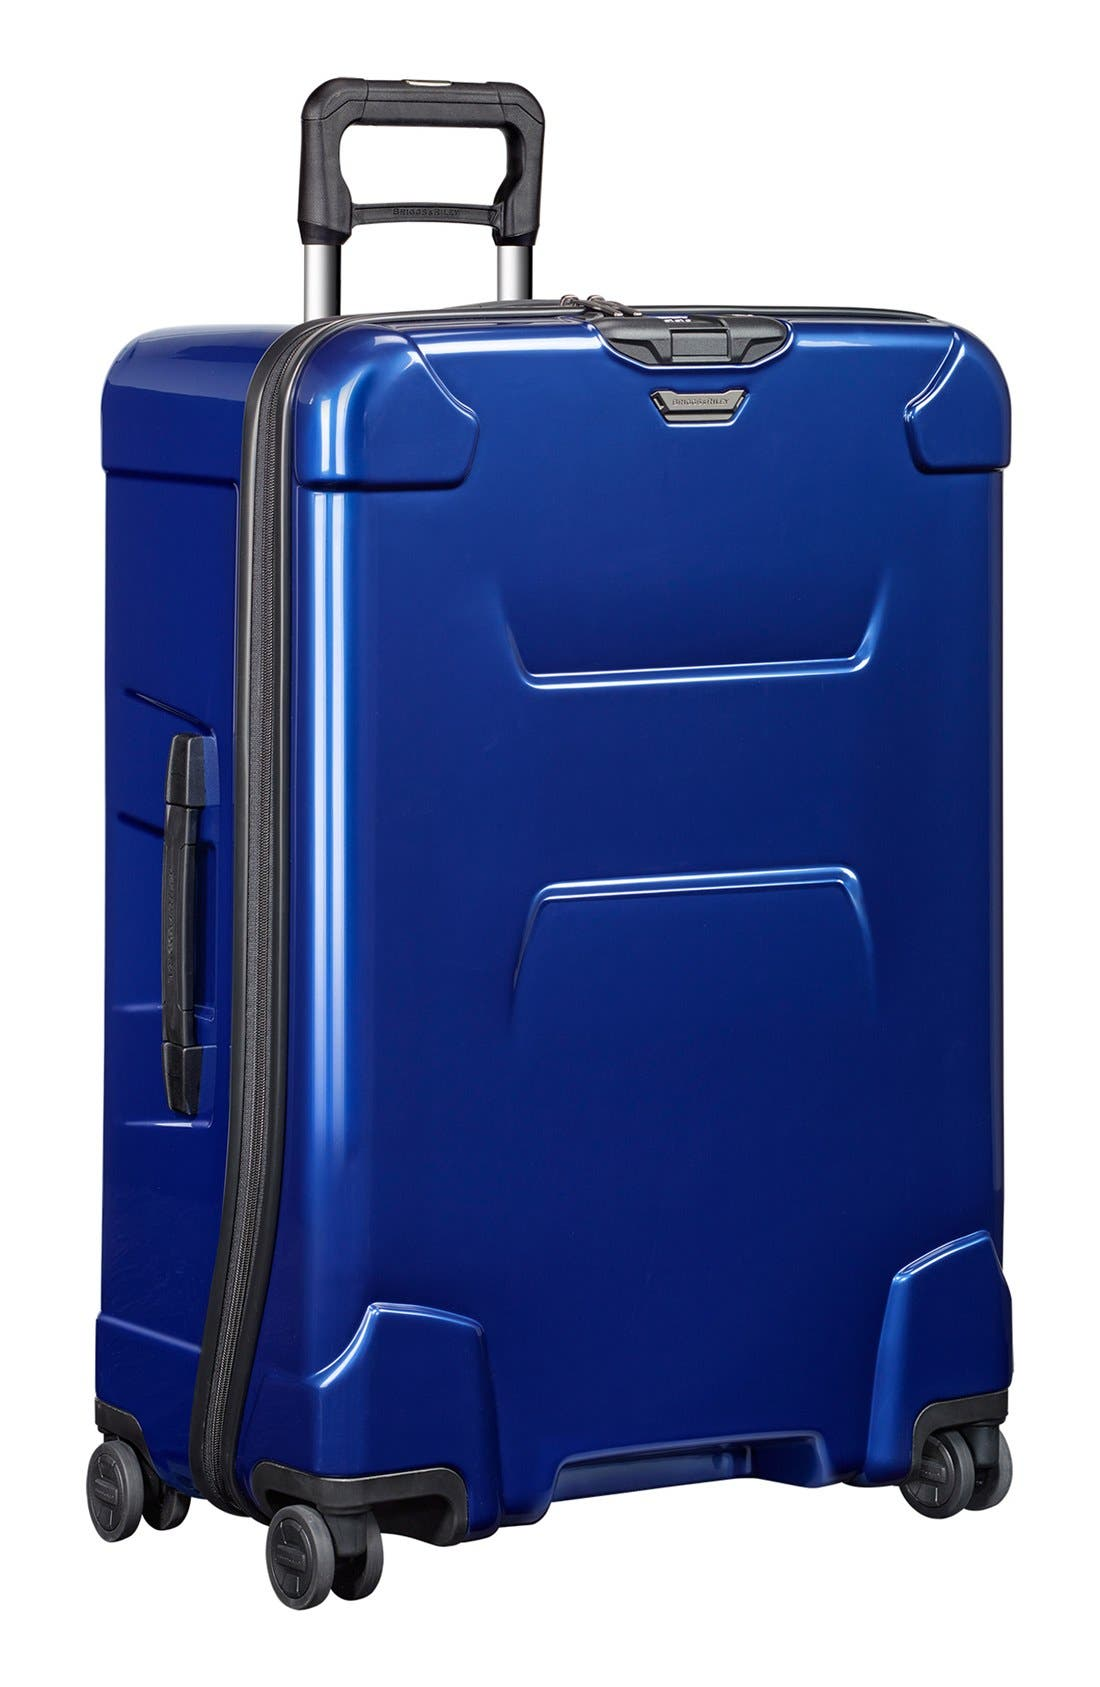 Alternate Image 1 Selected - Briggs & Riley 'Torq' LargeWheeled Packing Case